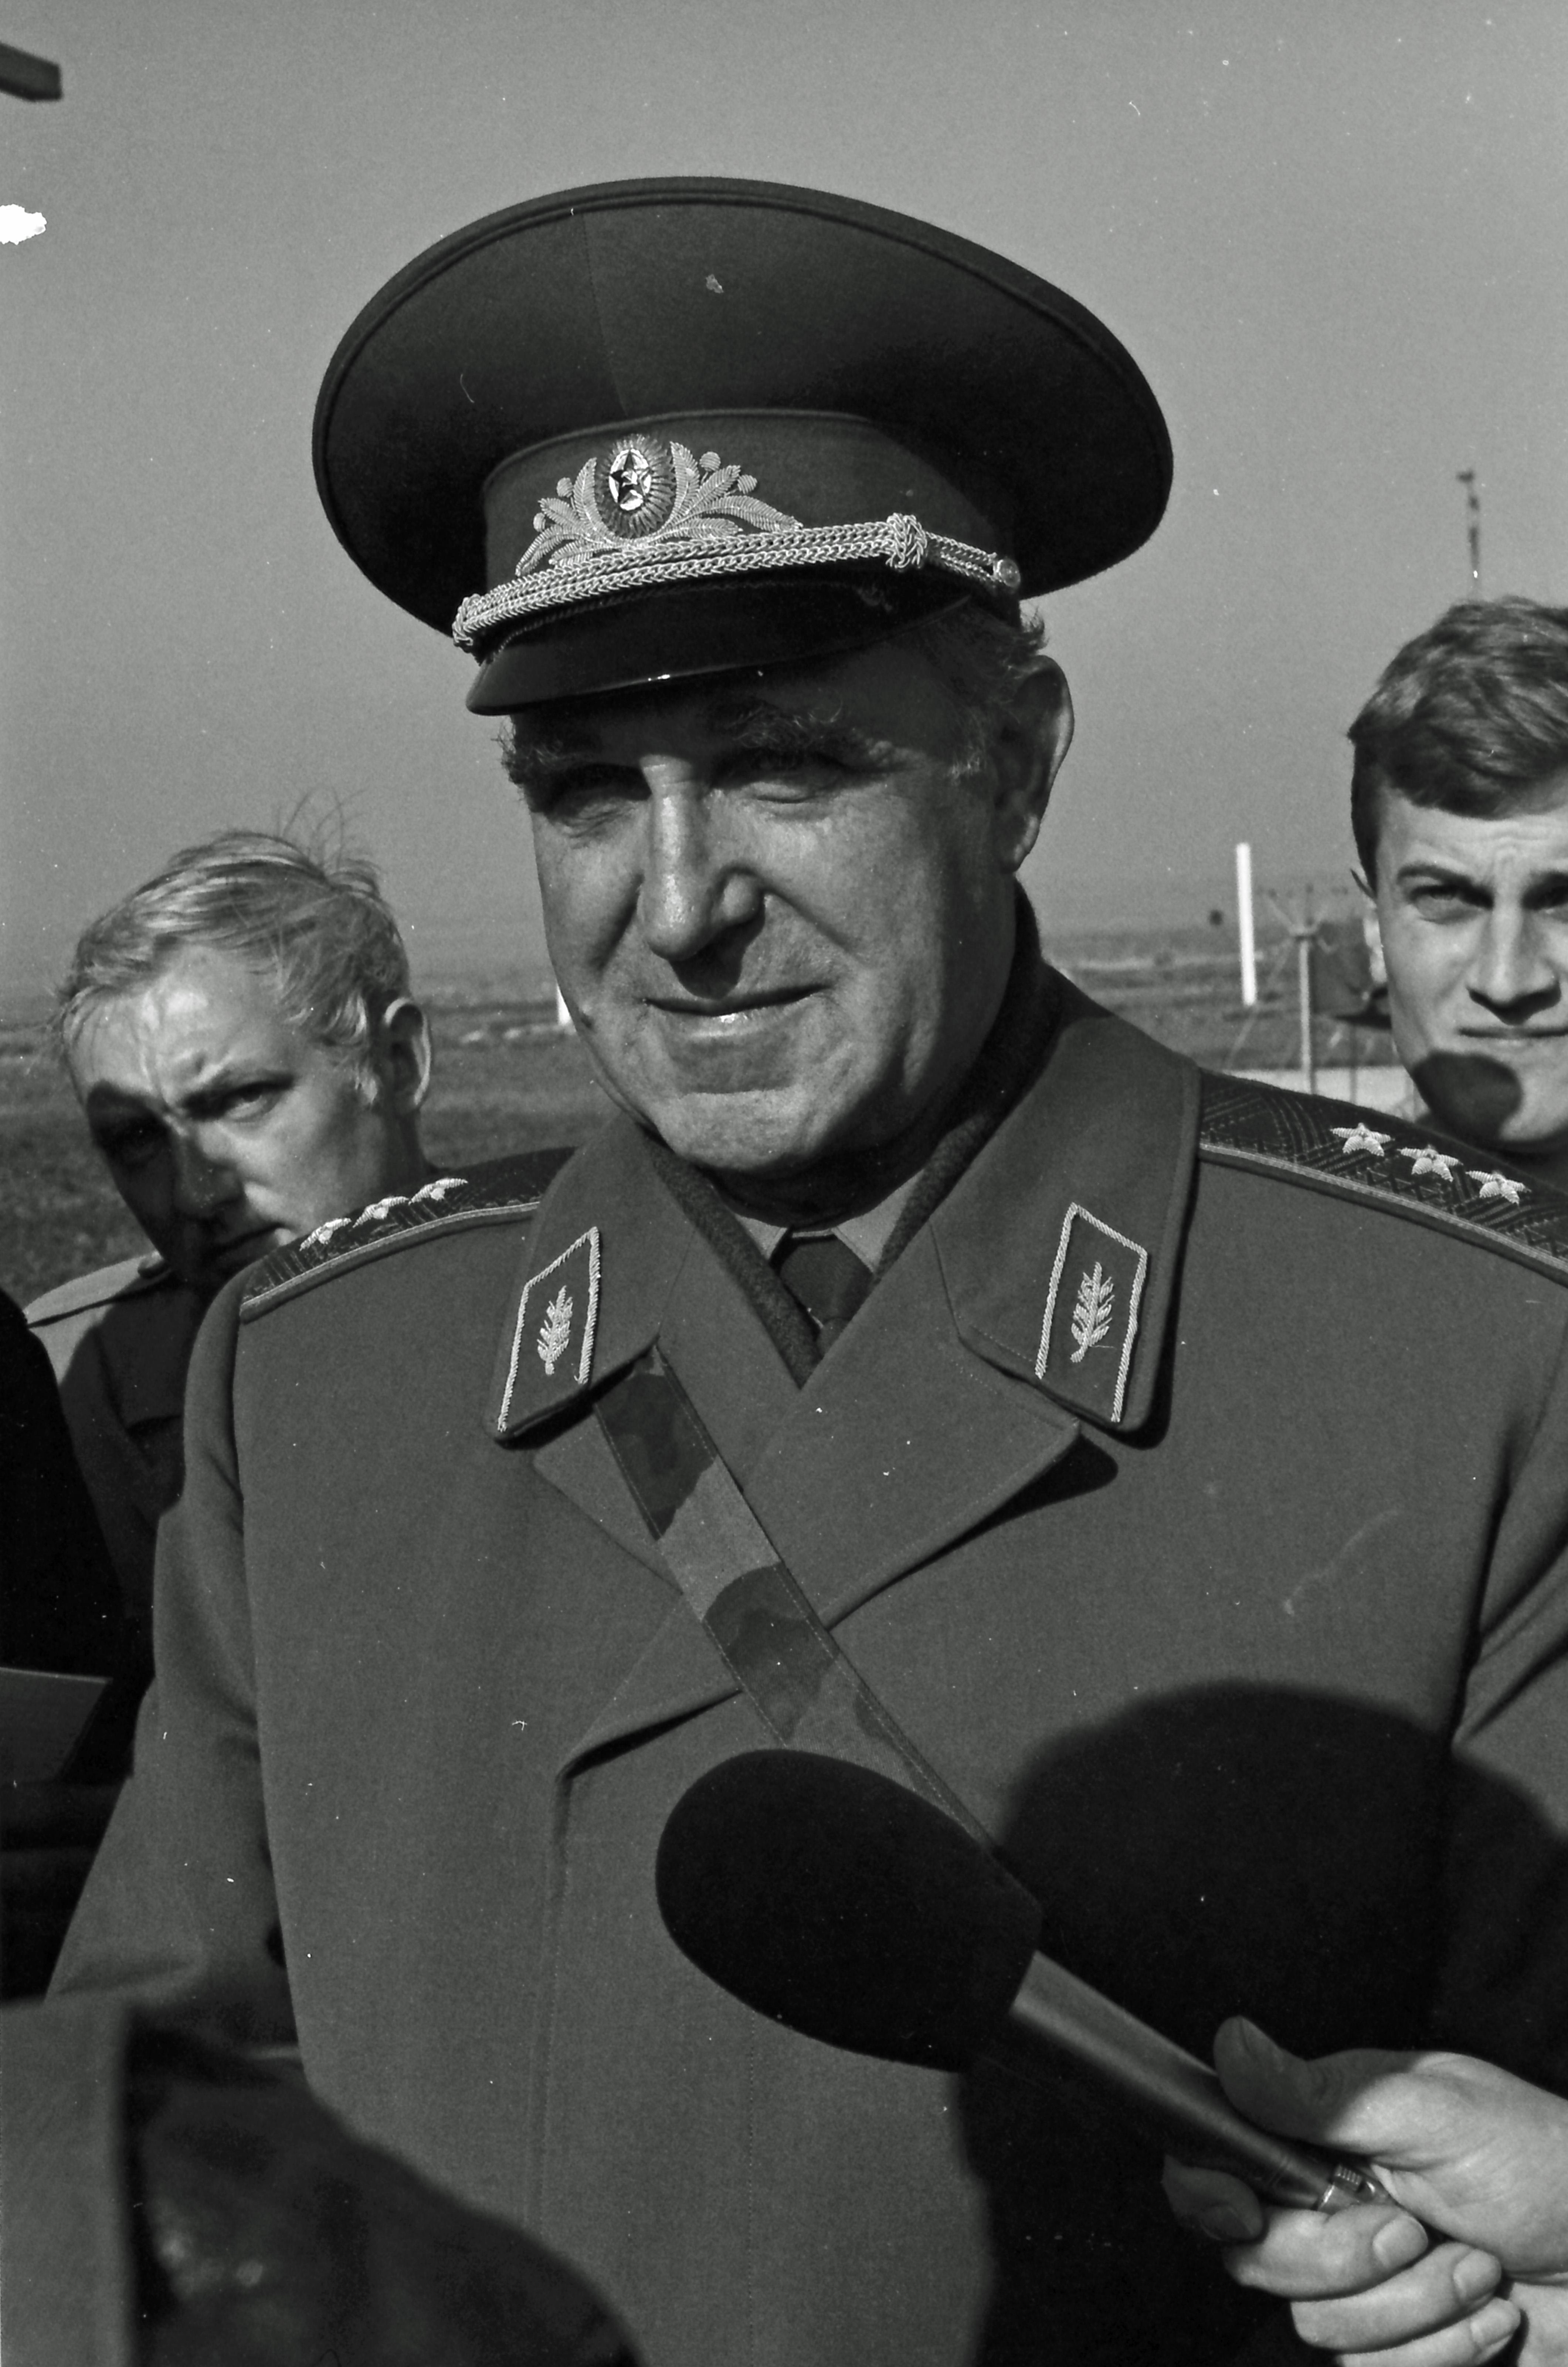 Colonel-General Vladimir Pikalov, commander of the Soviet Chemical Warfare Troops. © Hans de Vreij